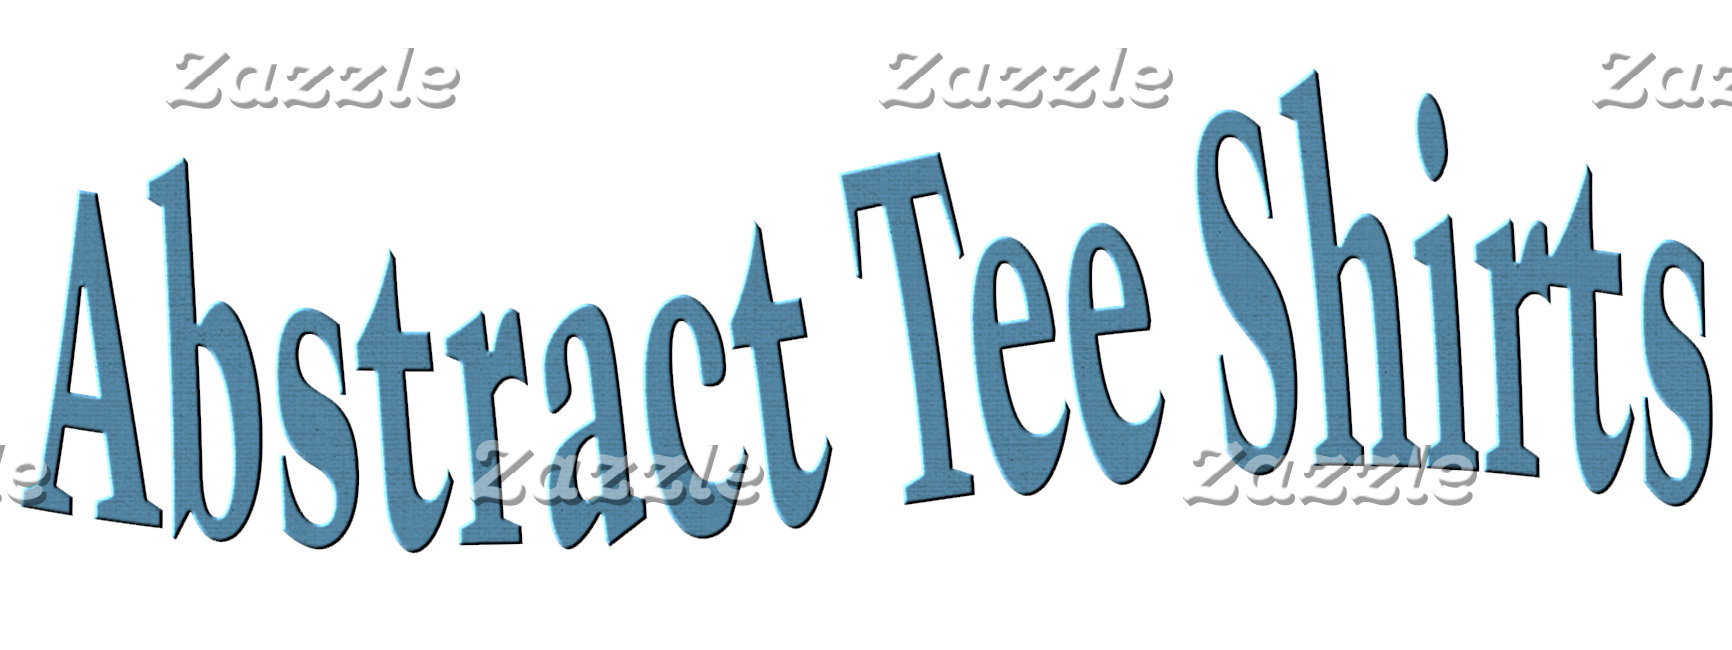 Abstract Tee Shirt Designs